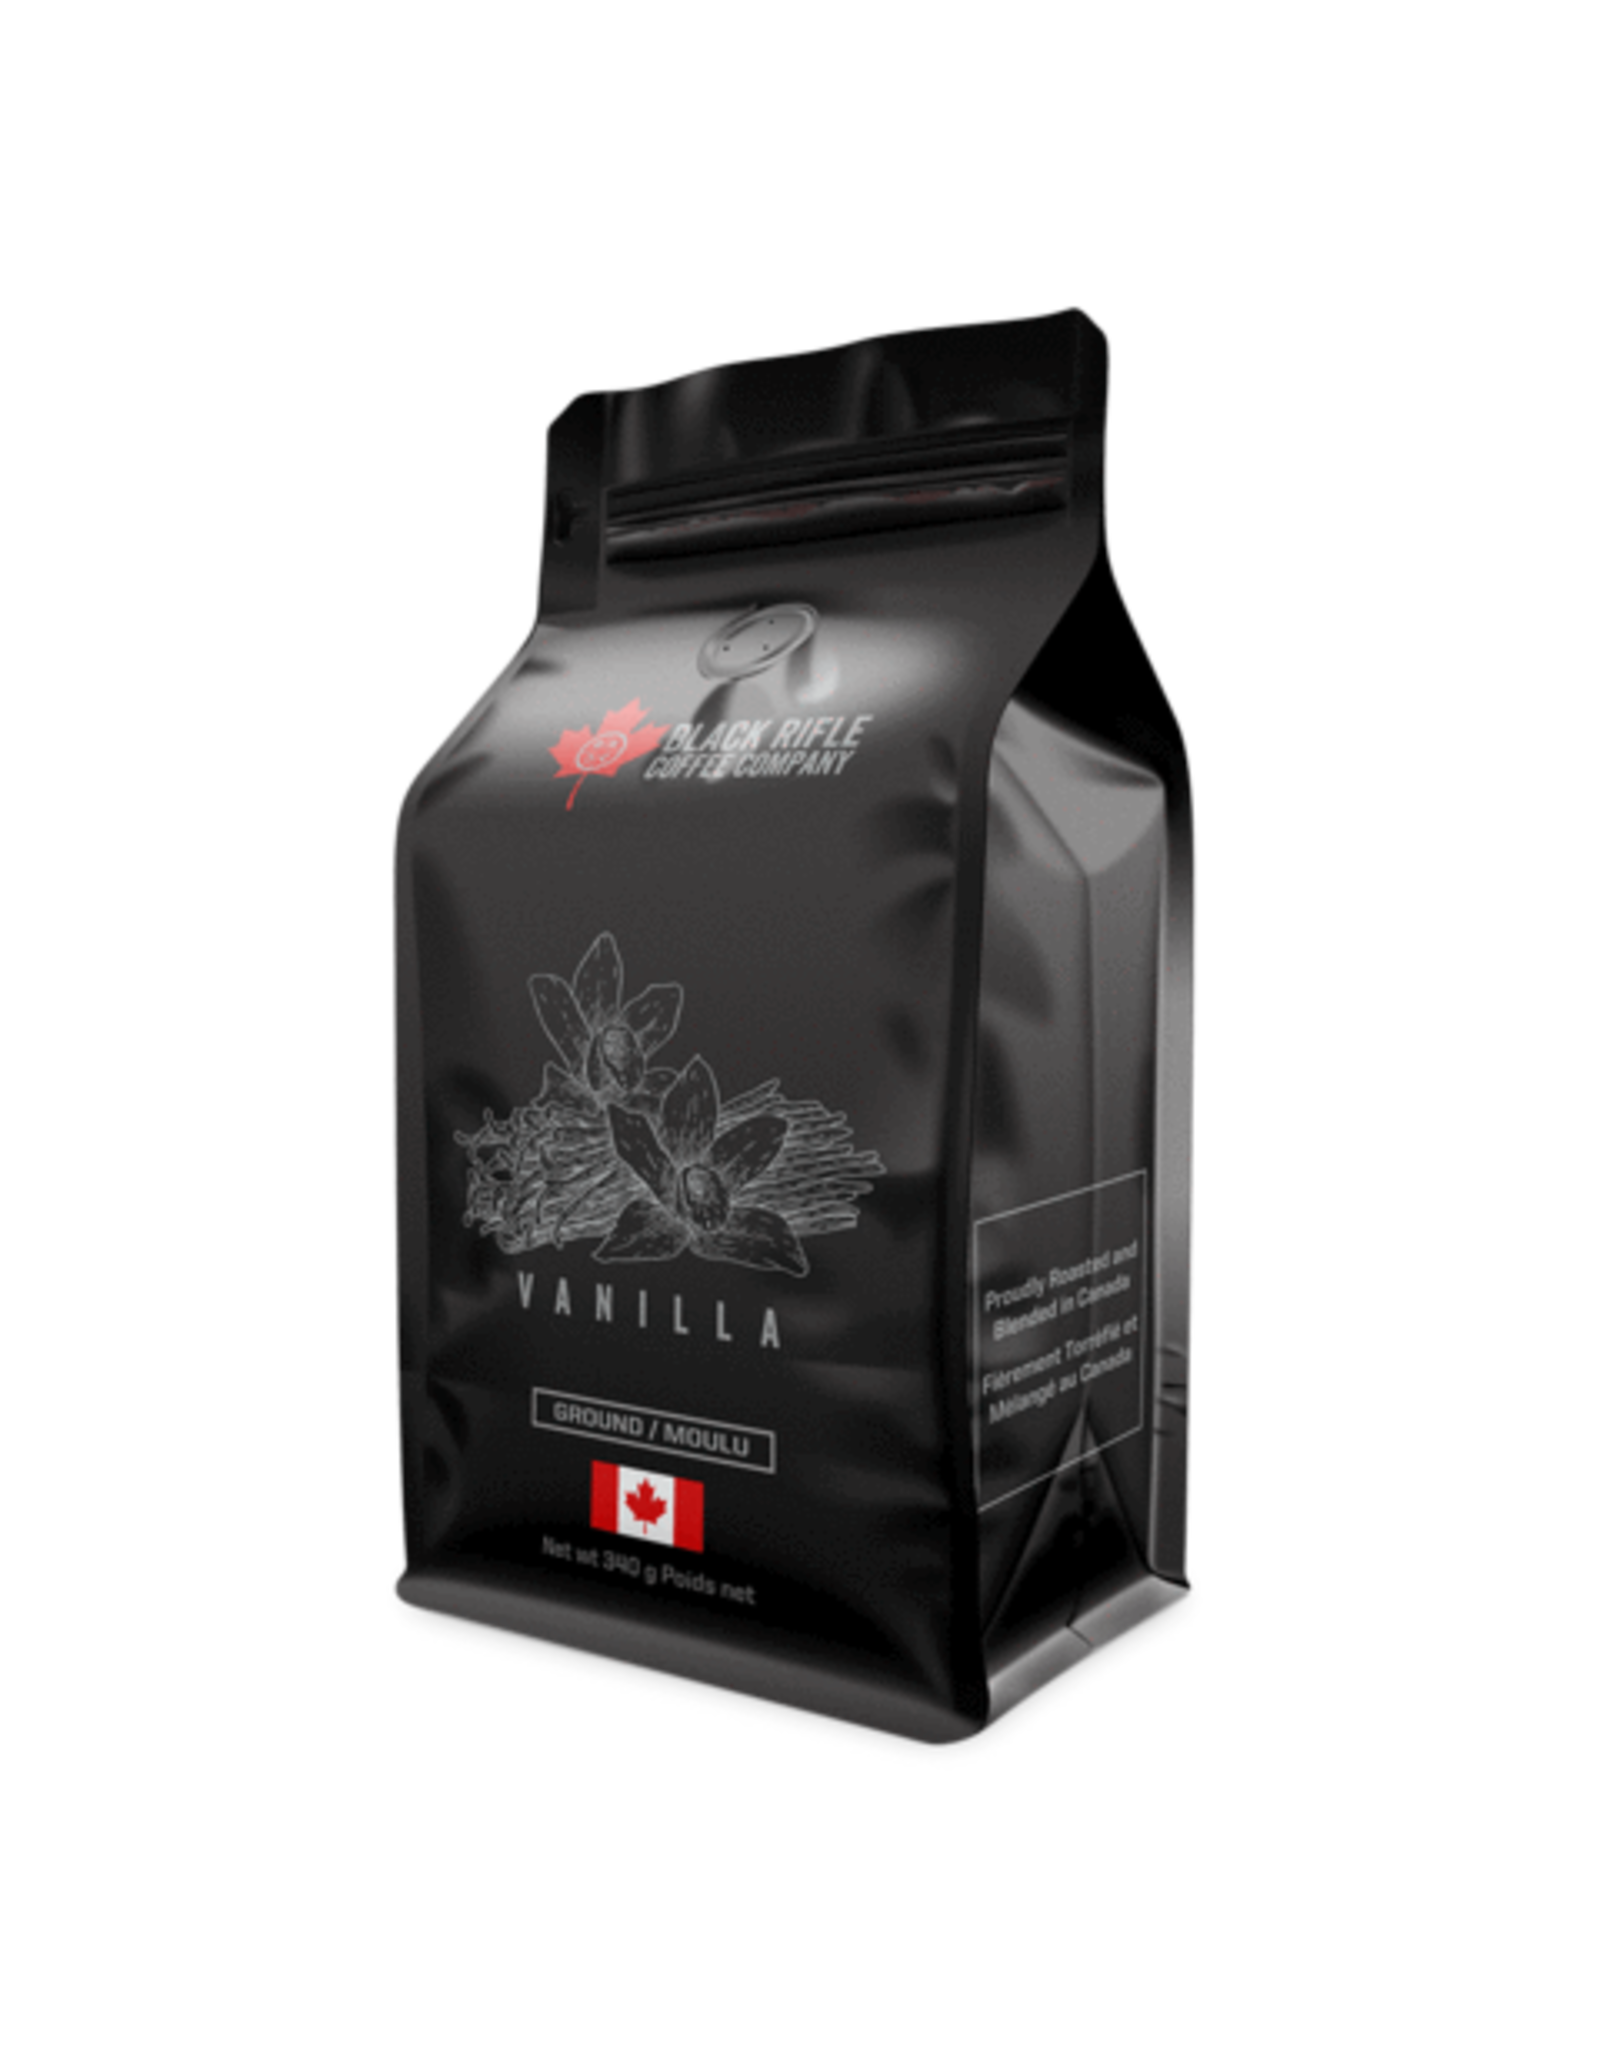 BLACK RIFLE COFFEE BLACK RIFLE COFFEE CO. FLAVOURED COFFEE